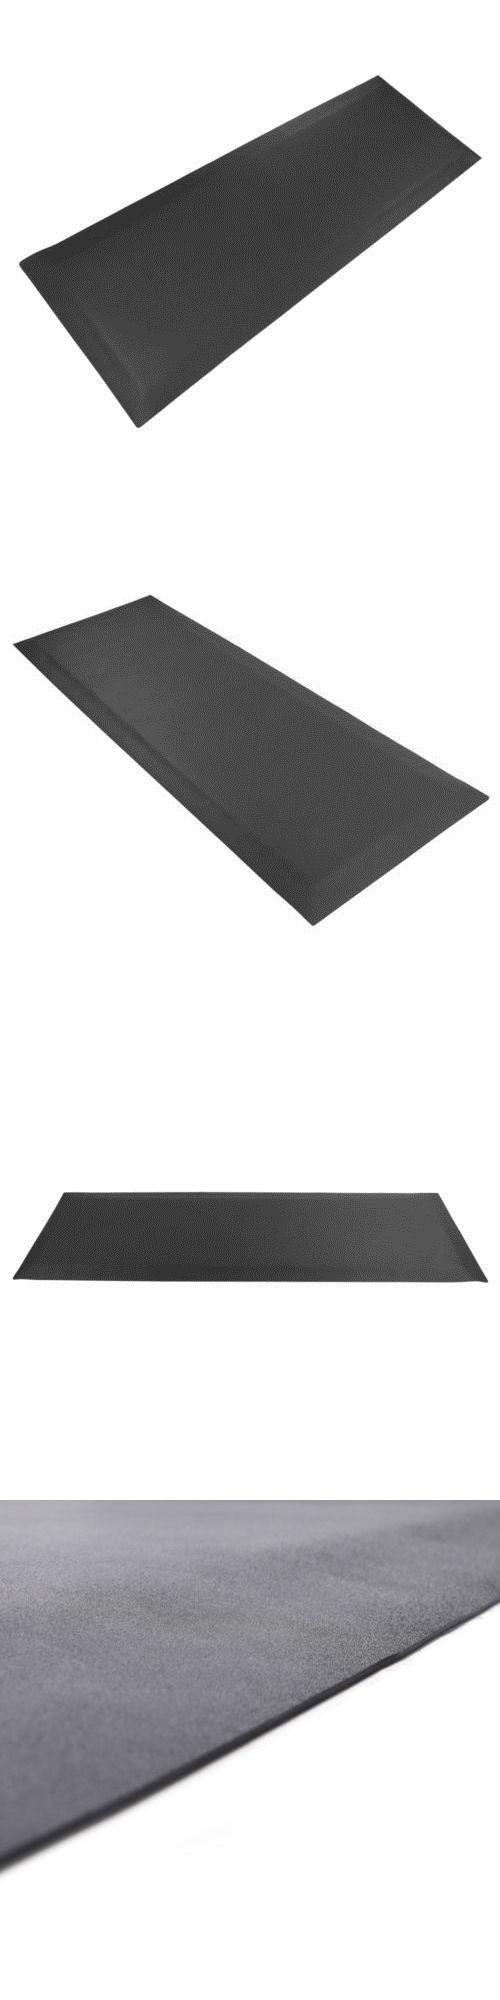 Anti Fatigue Floor Mat Foam Gel Kitchen Rug Office Standing Mat Black//Grey